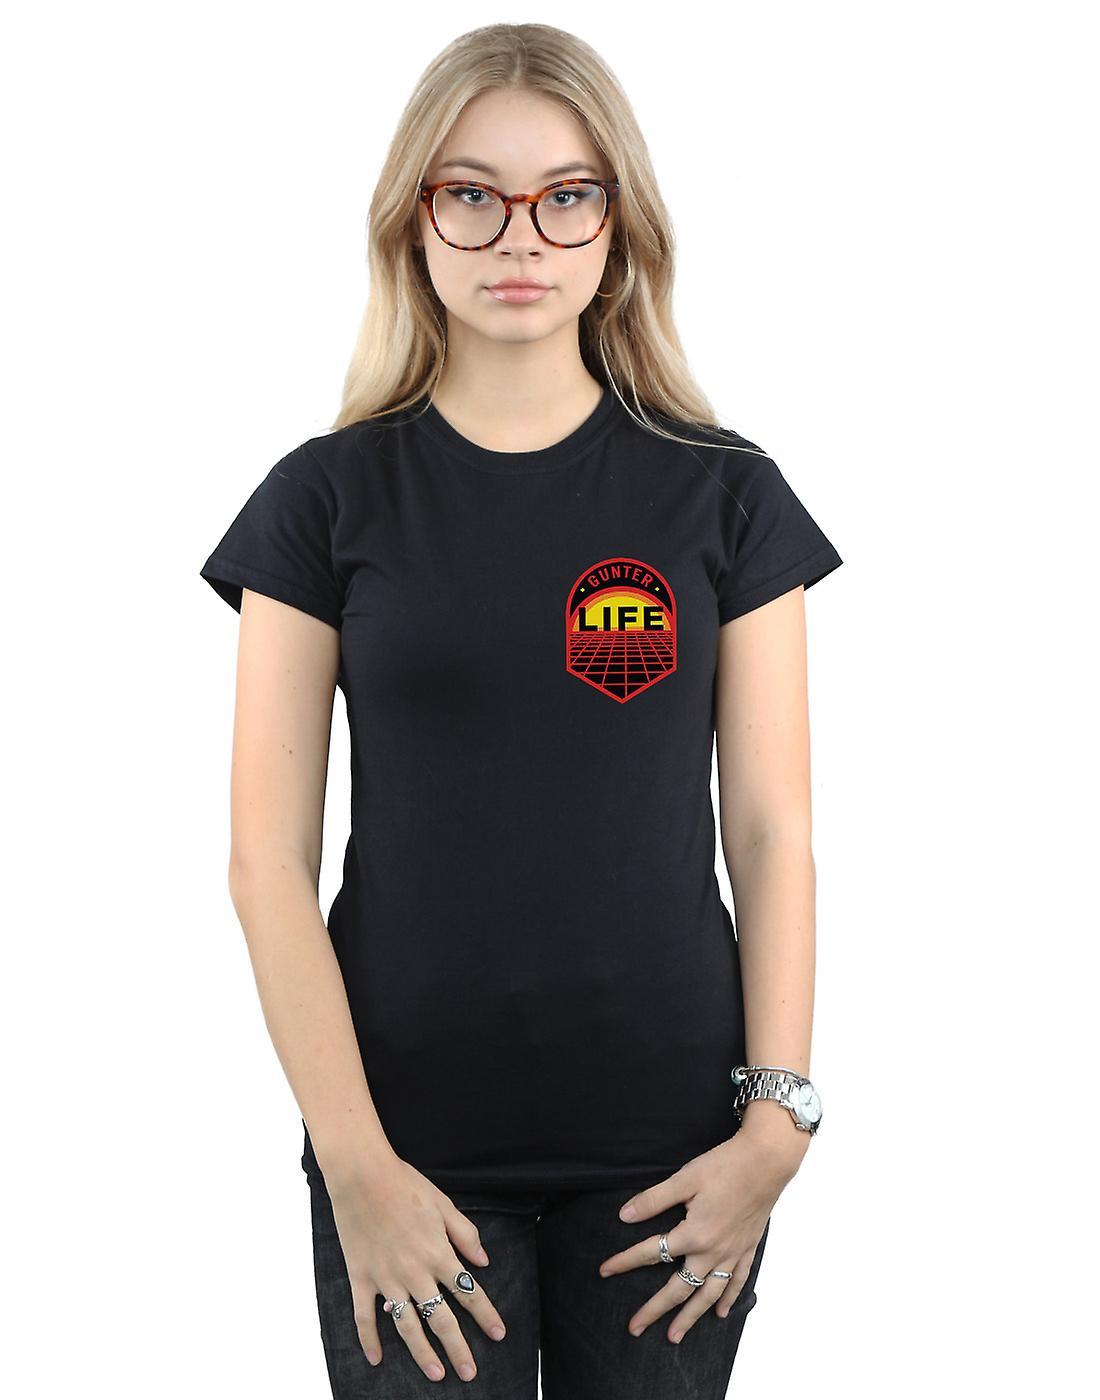 Ready Player One Women's Gunter Life Breast Logo T-Shirt